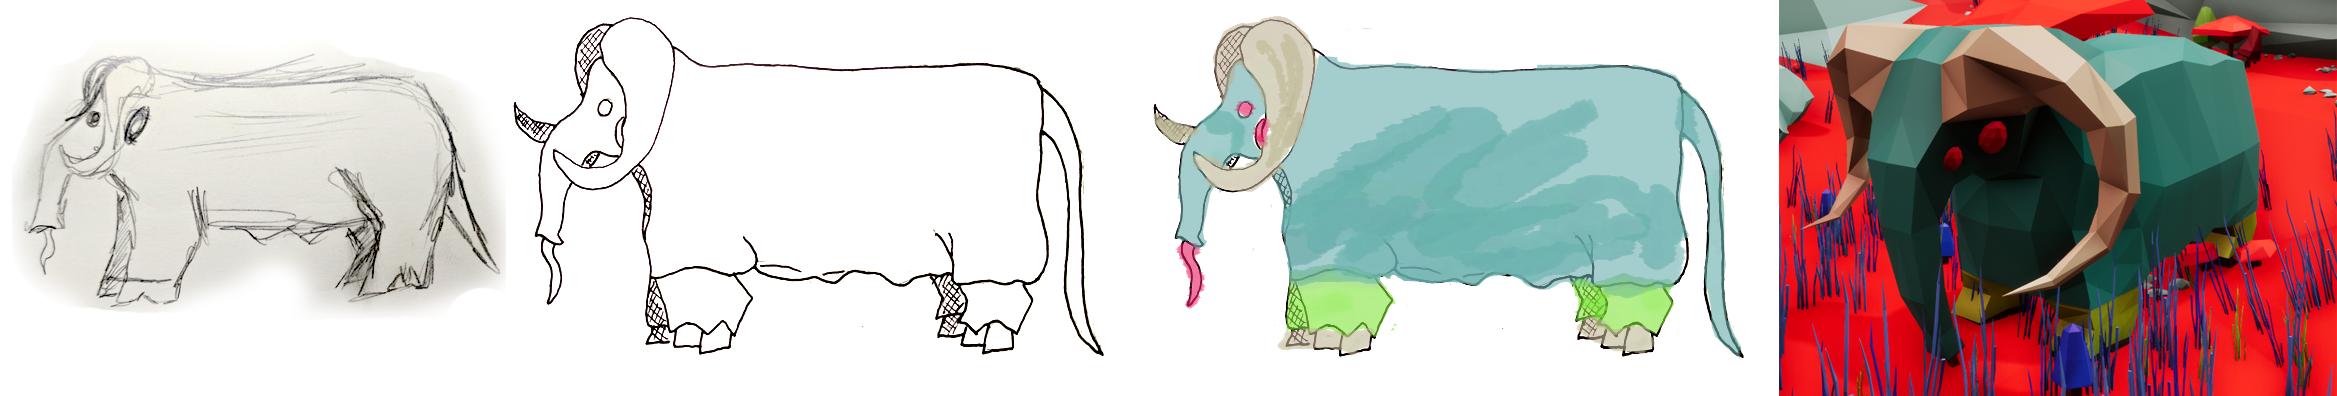 Progress of a creature